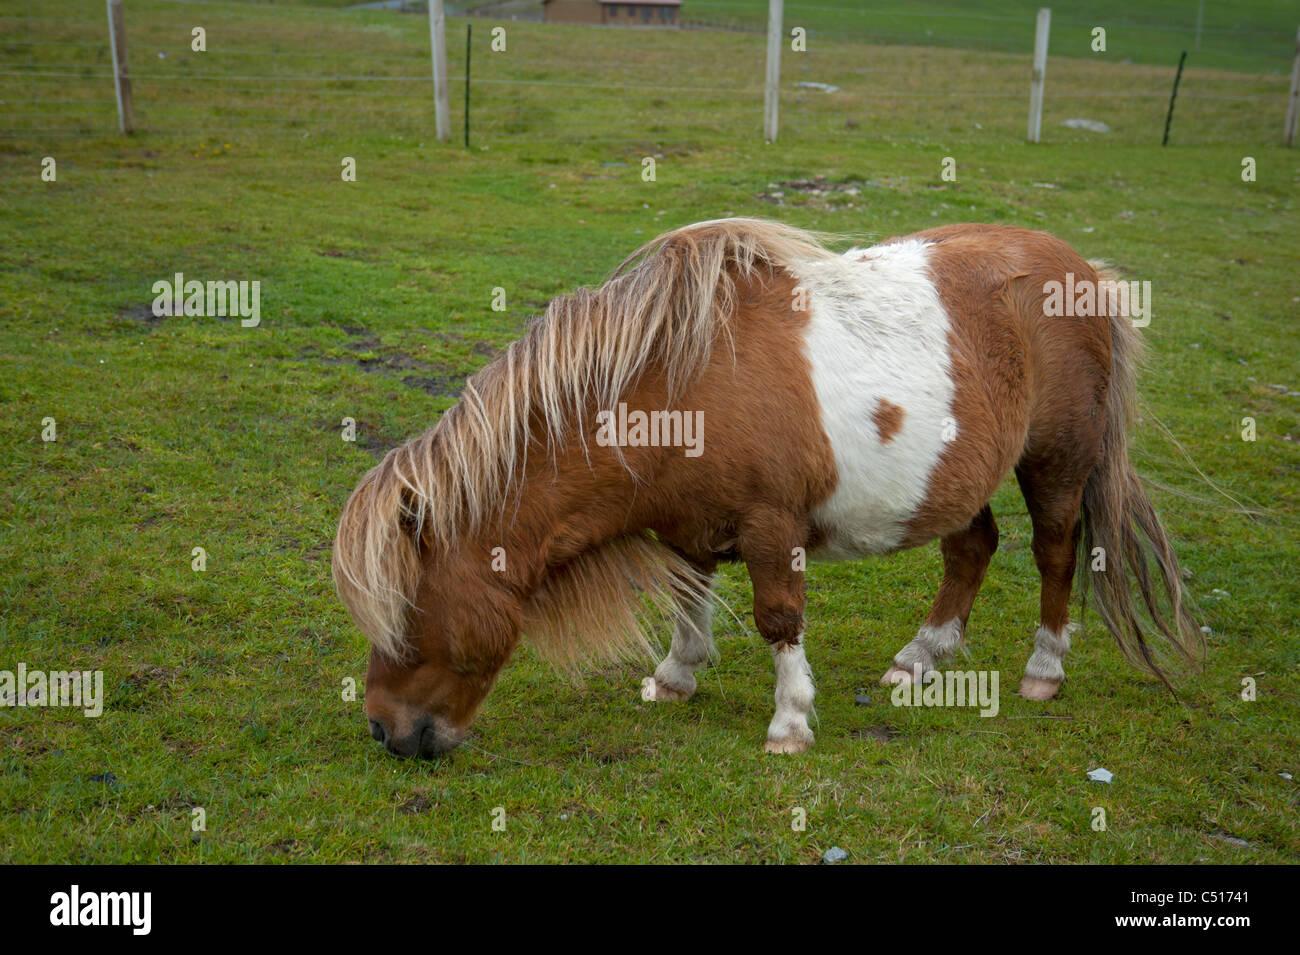 Shetland-Pony in der Nähe von Brücke Wände, Mainland, Shetland. SCO 7416 Stockbild